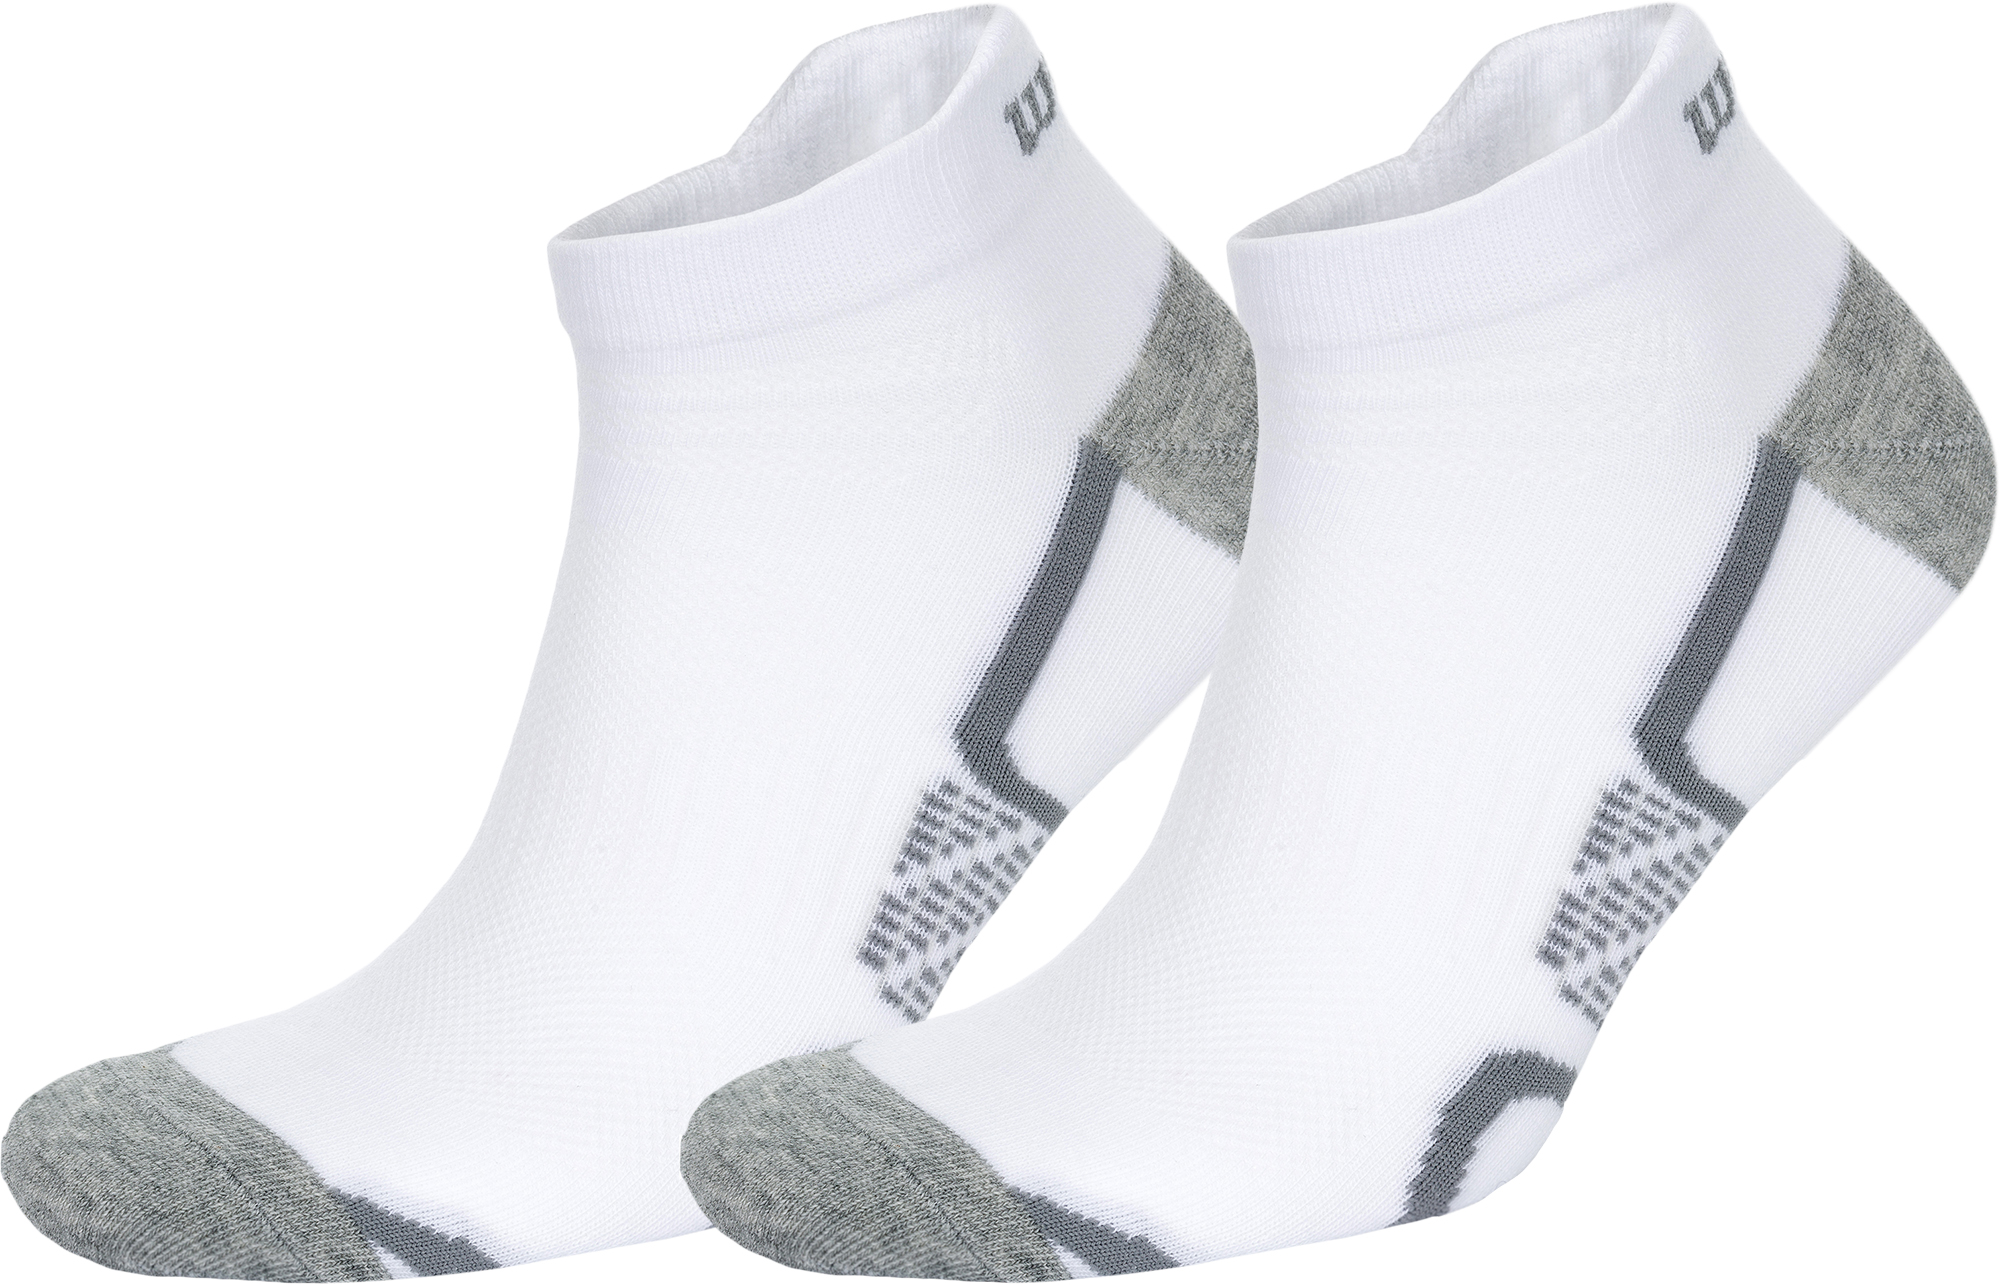 Wilson Носки мужские Wilson, 2 пары, размер 39-42 wilson носки мужские wilson premium 2 пары размер 35 38